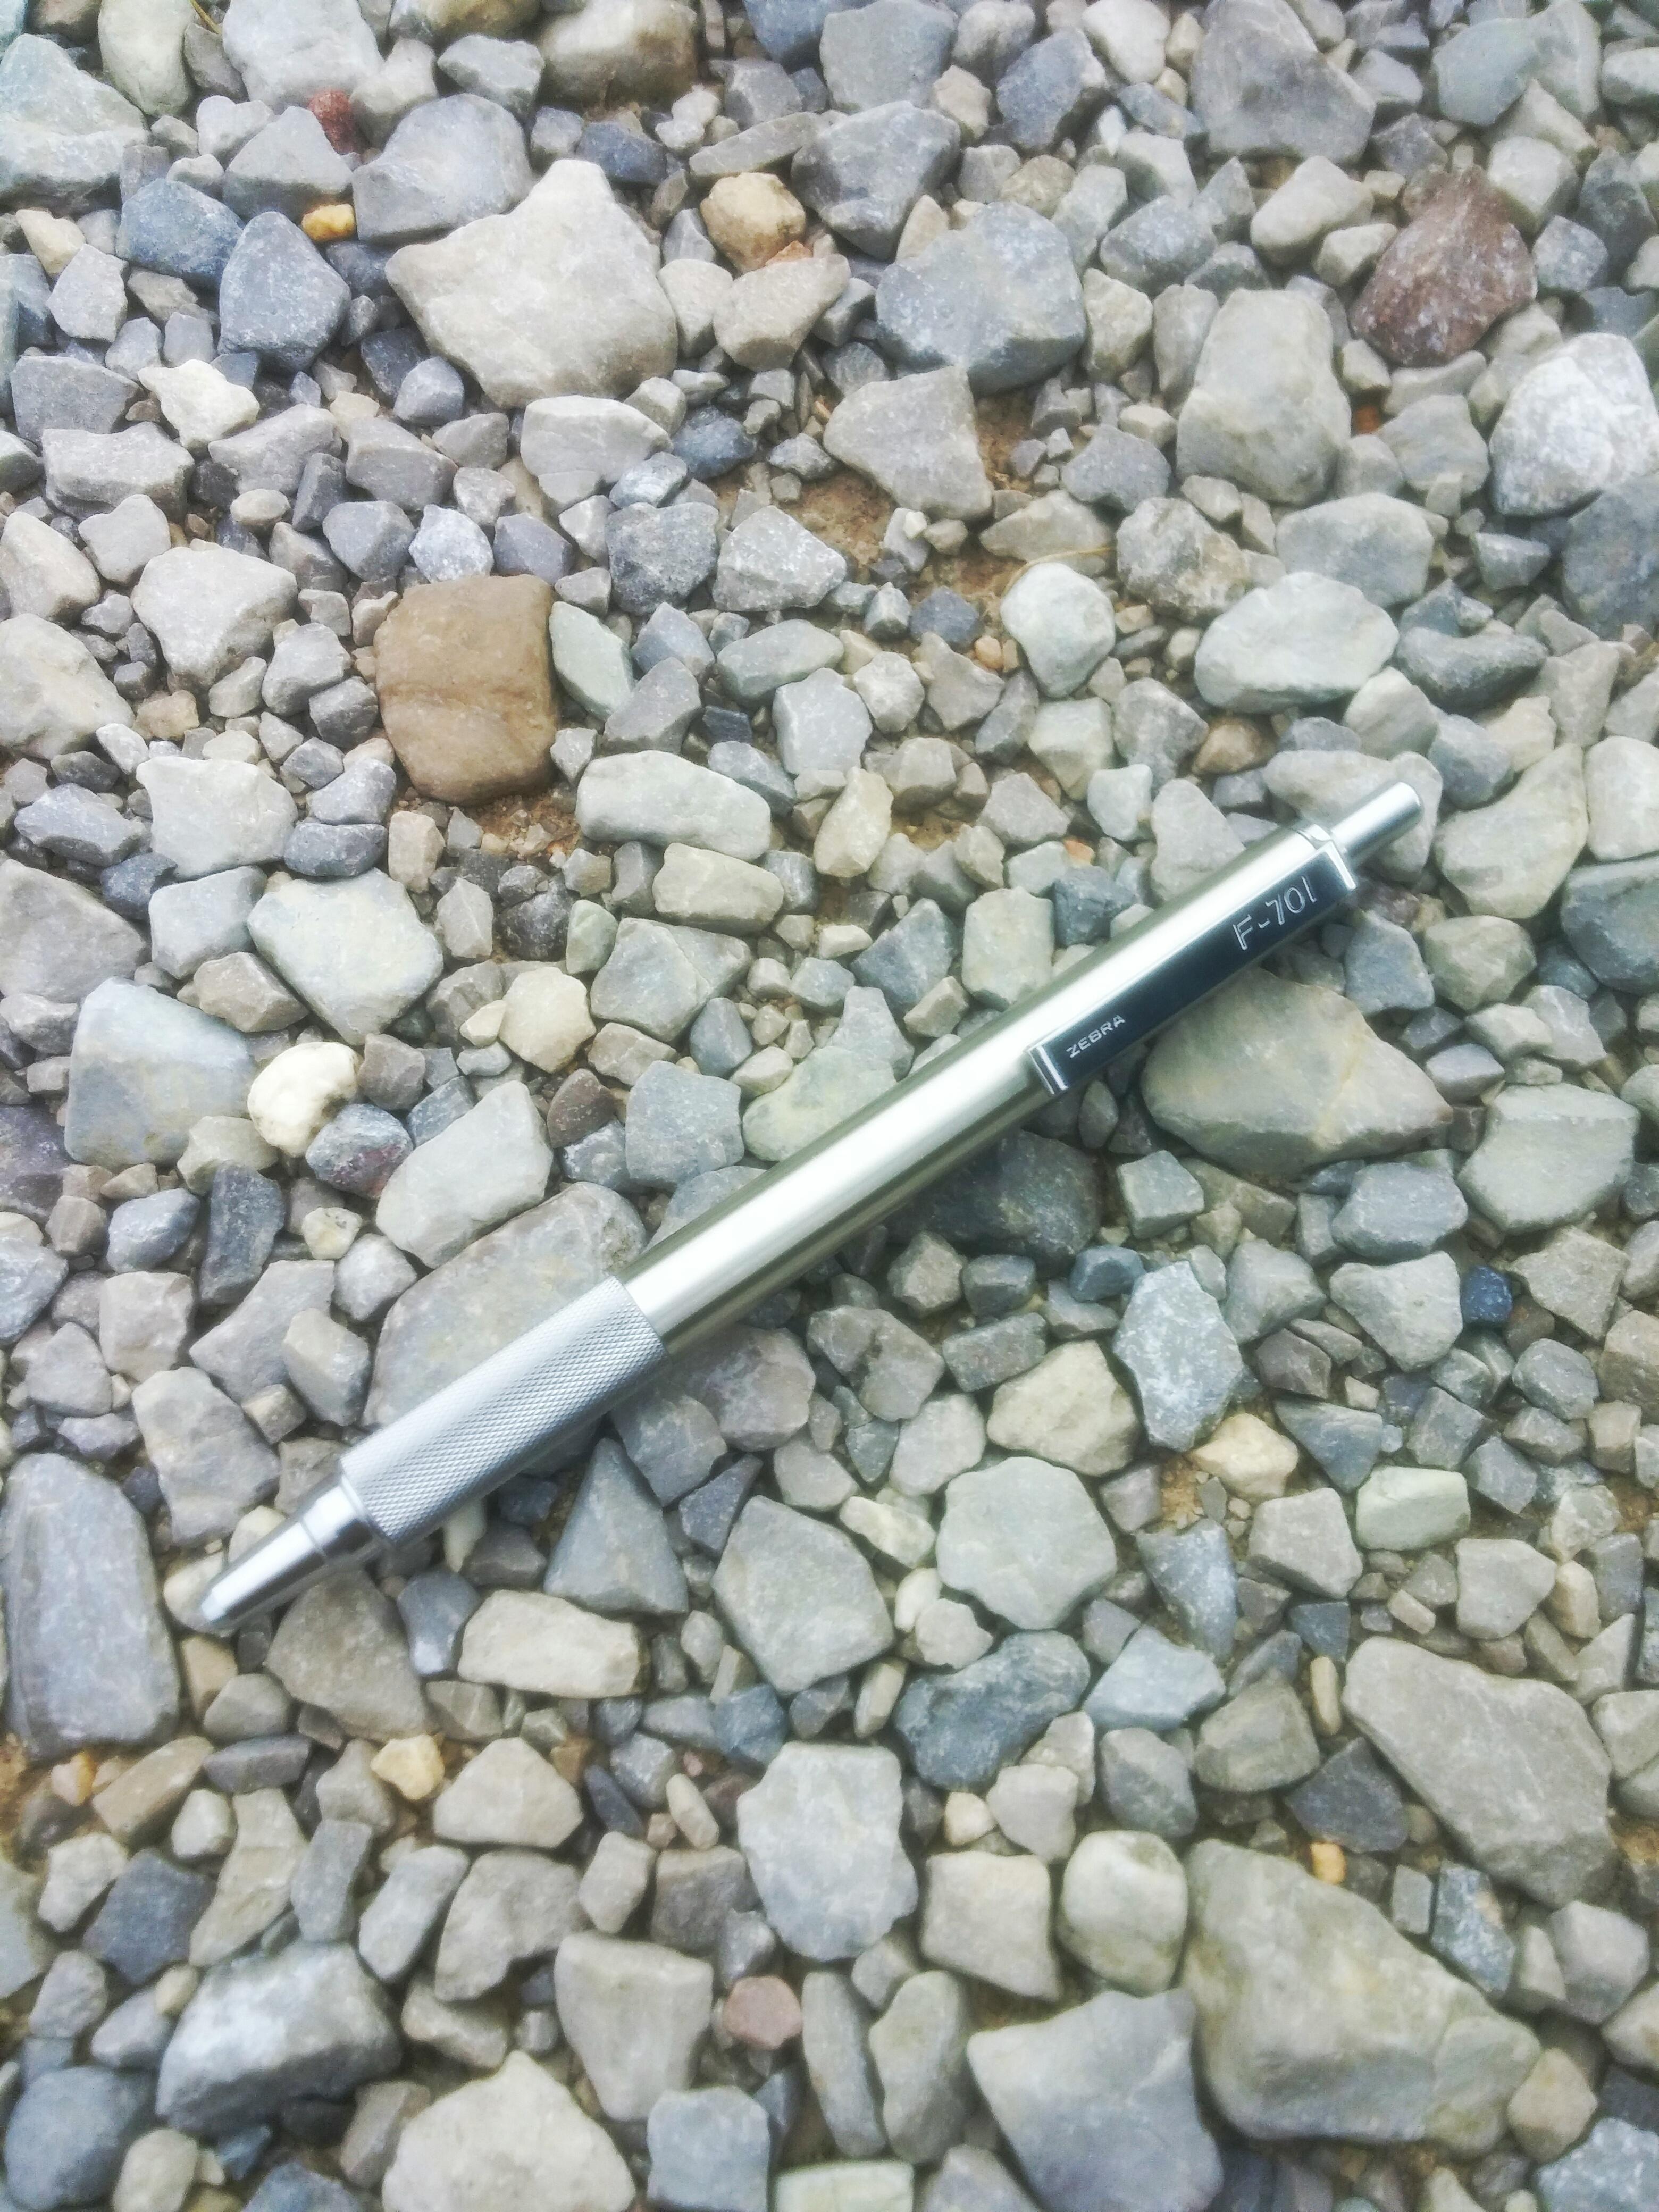 The ultimate EDC pen